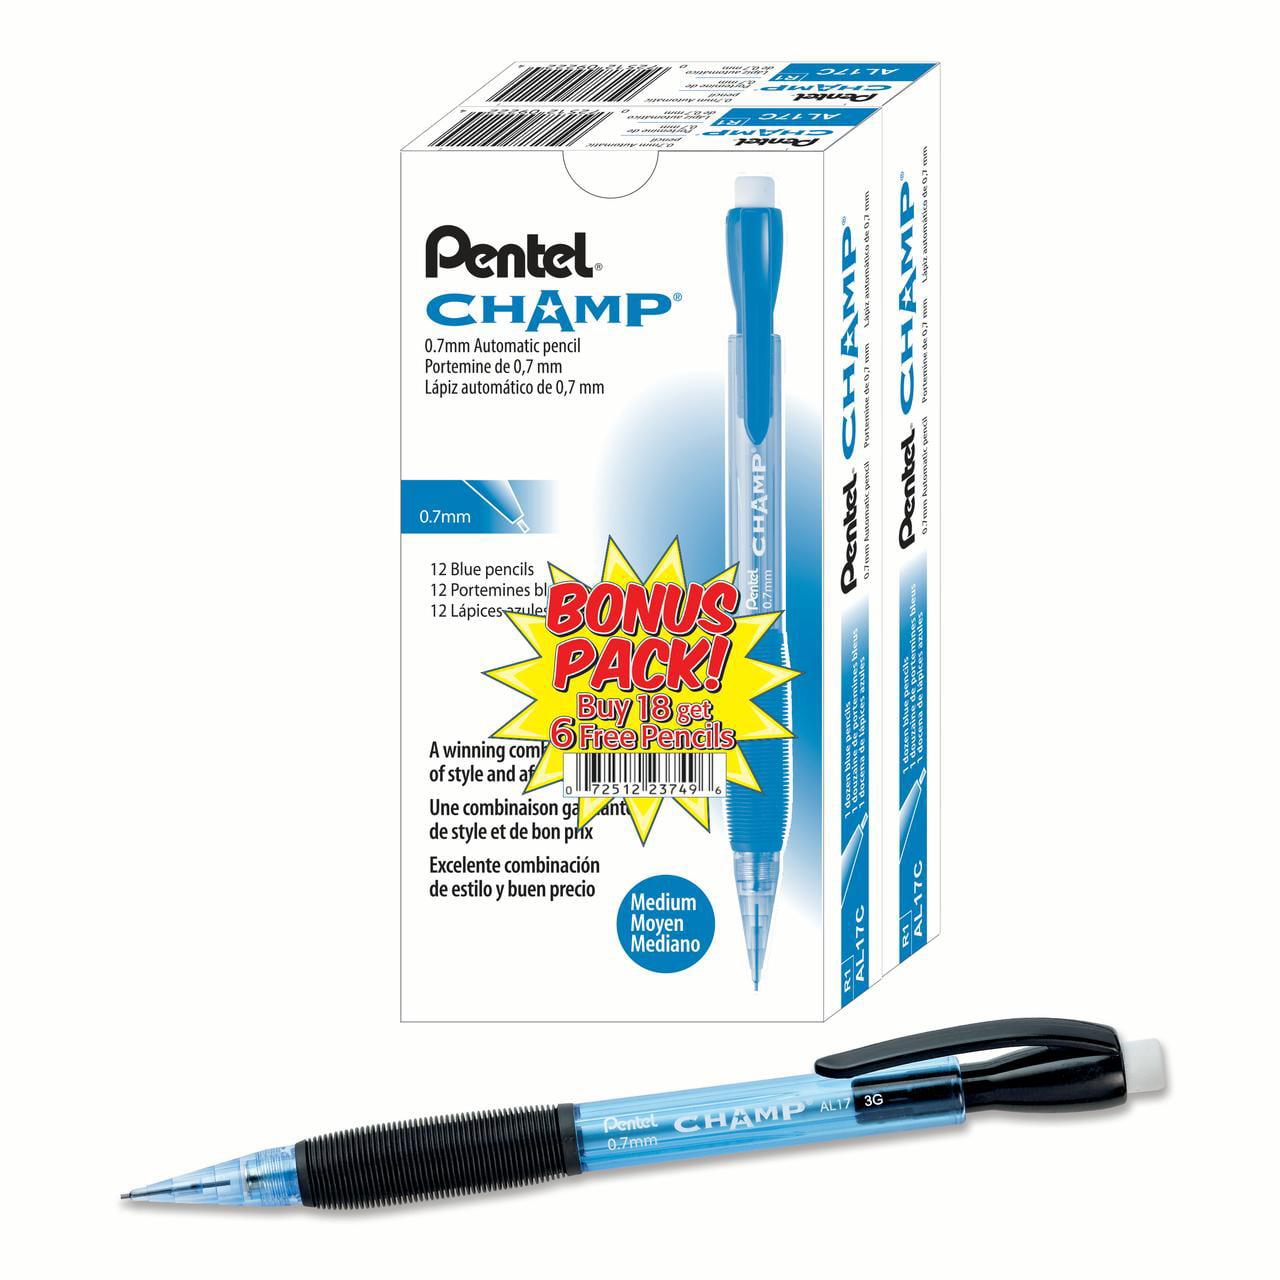 Pentel Champ Mechanical #2 Pencil, 0.7 mm, Blue Barrel, 24pk